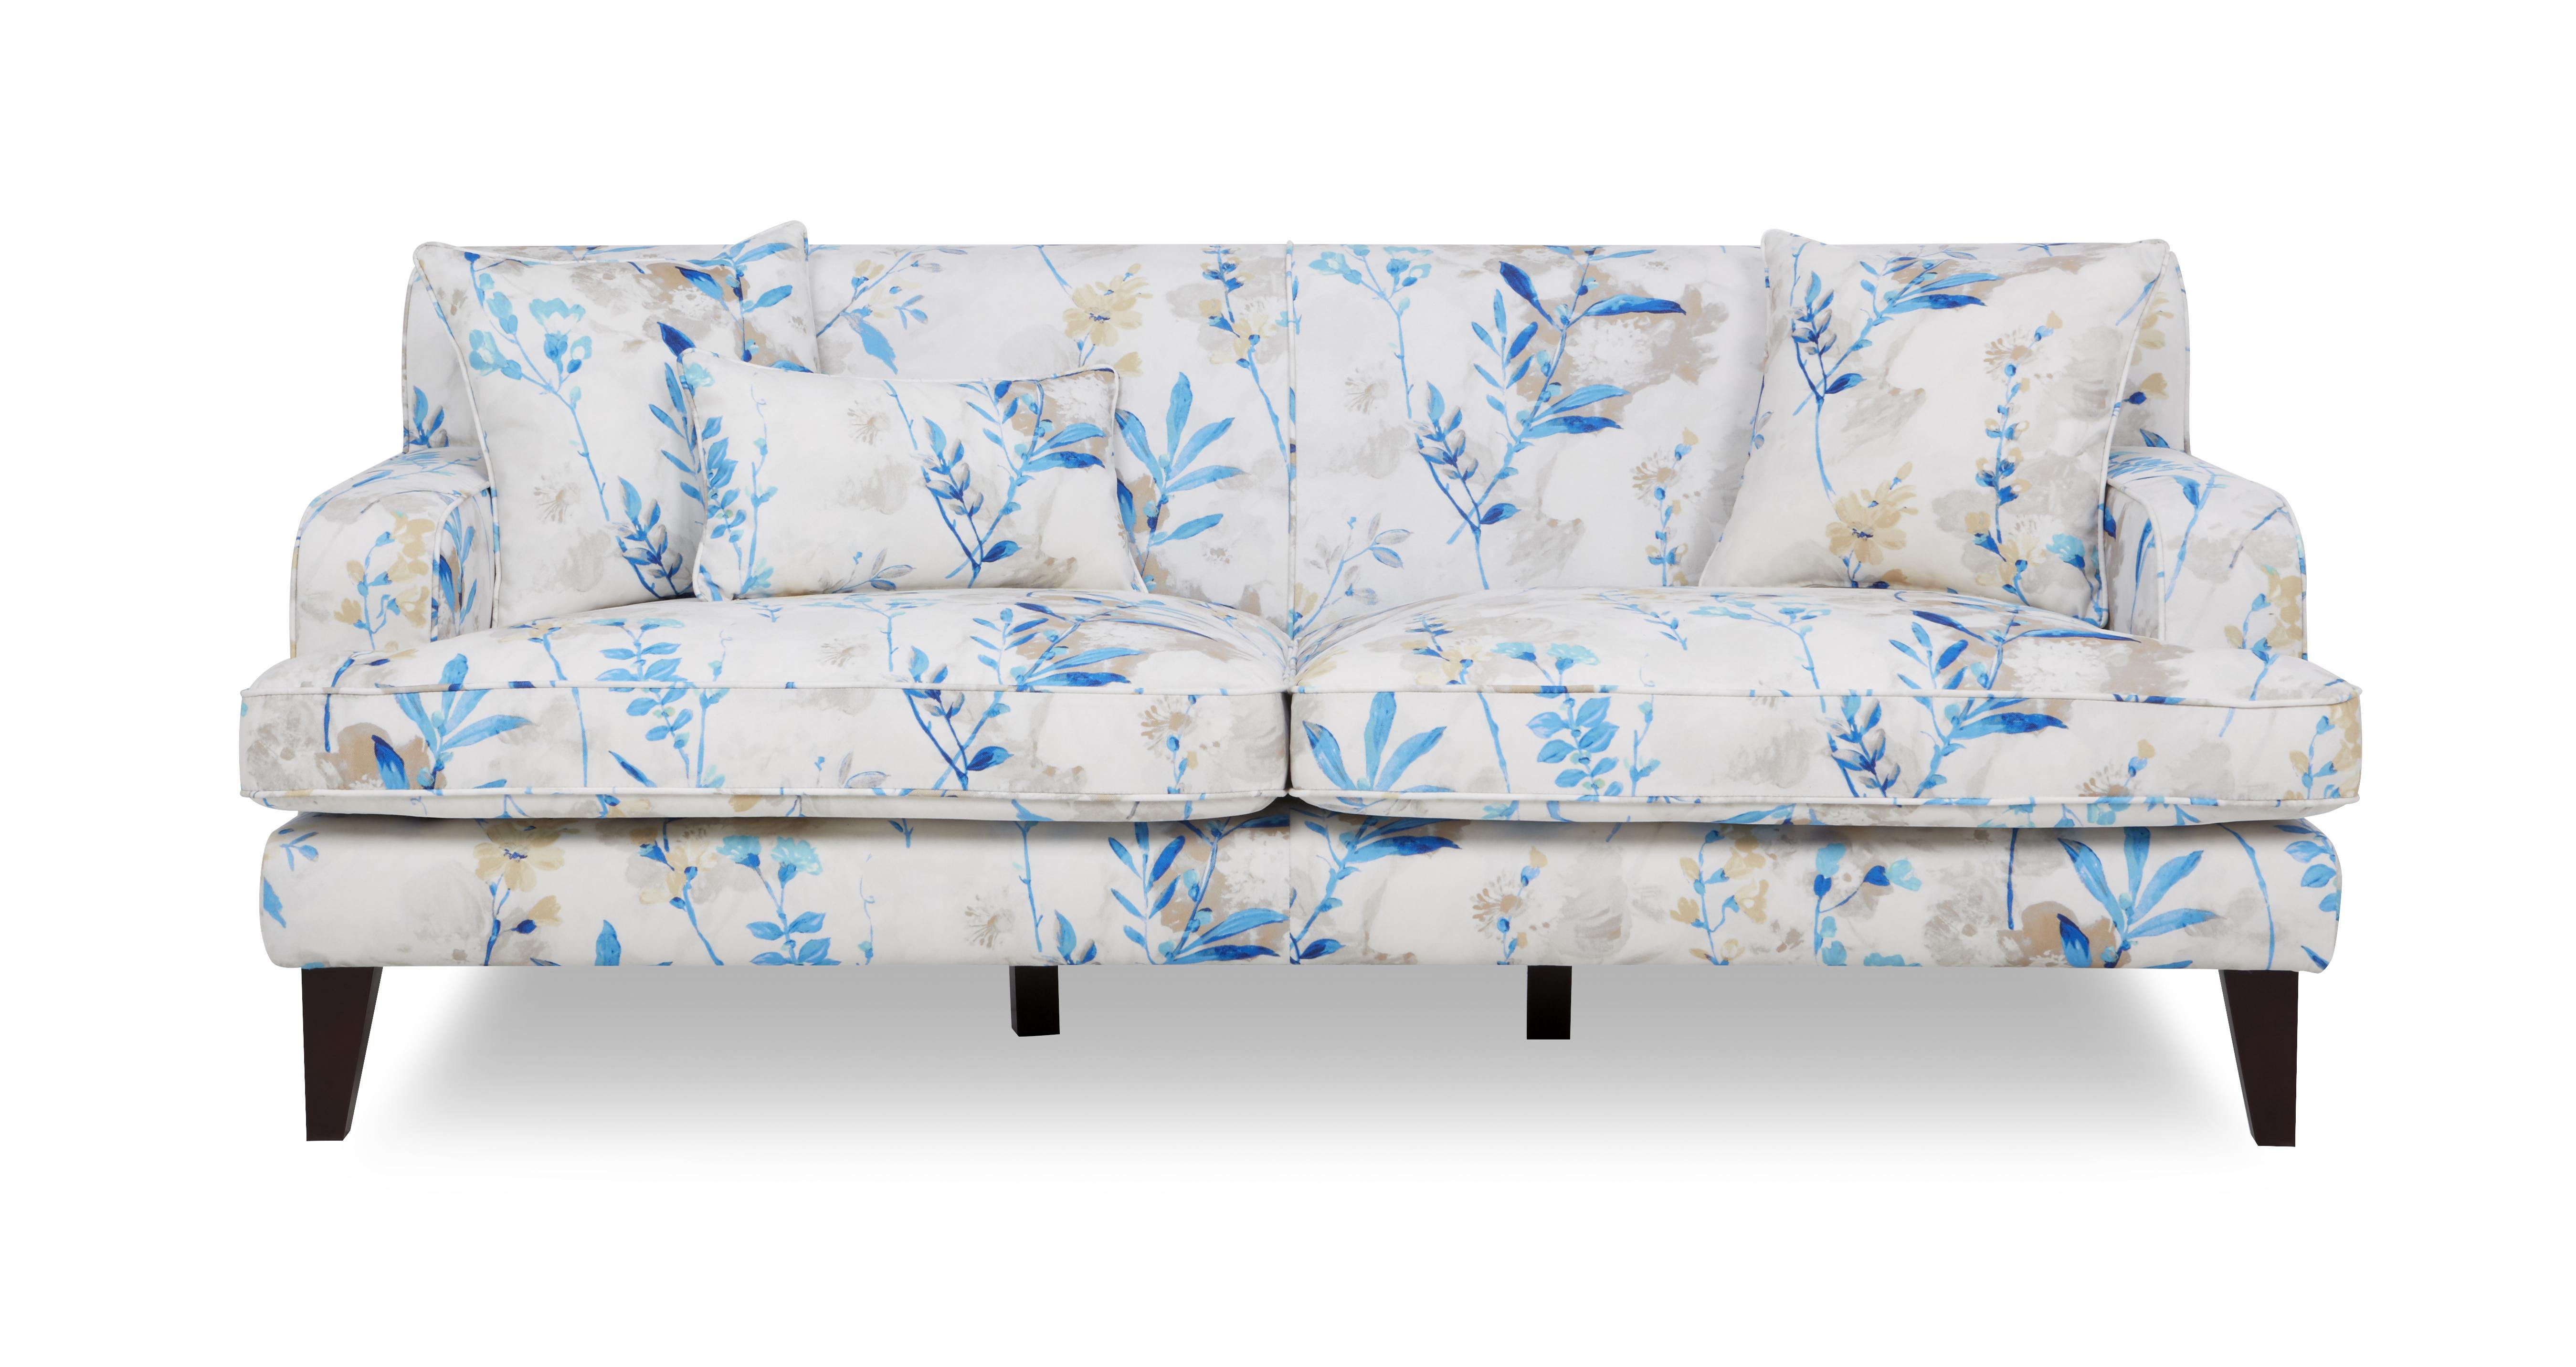 Penelope Floral 3 Seater Sofa Penelope Floral